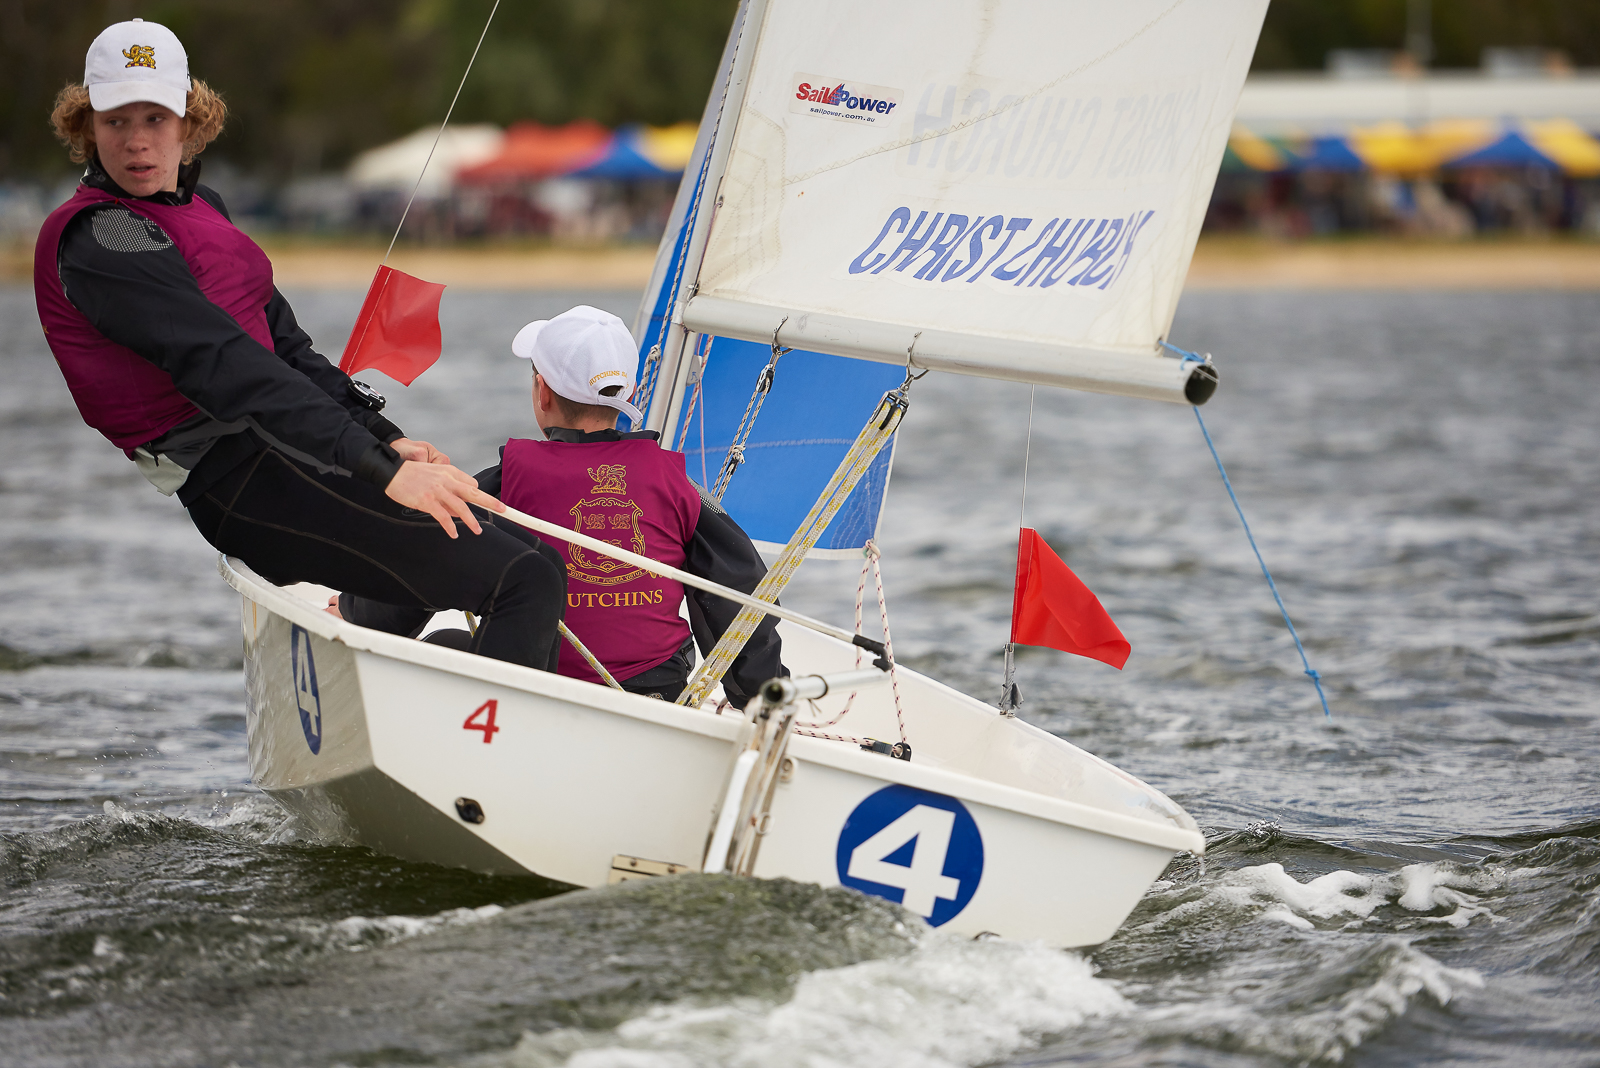 School Team Sailing's pinnacle event to hit Blairgowrie waters